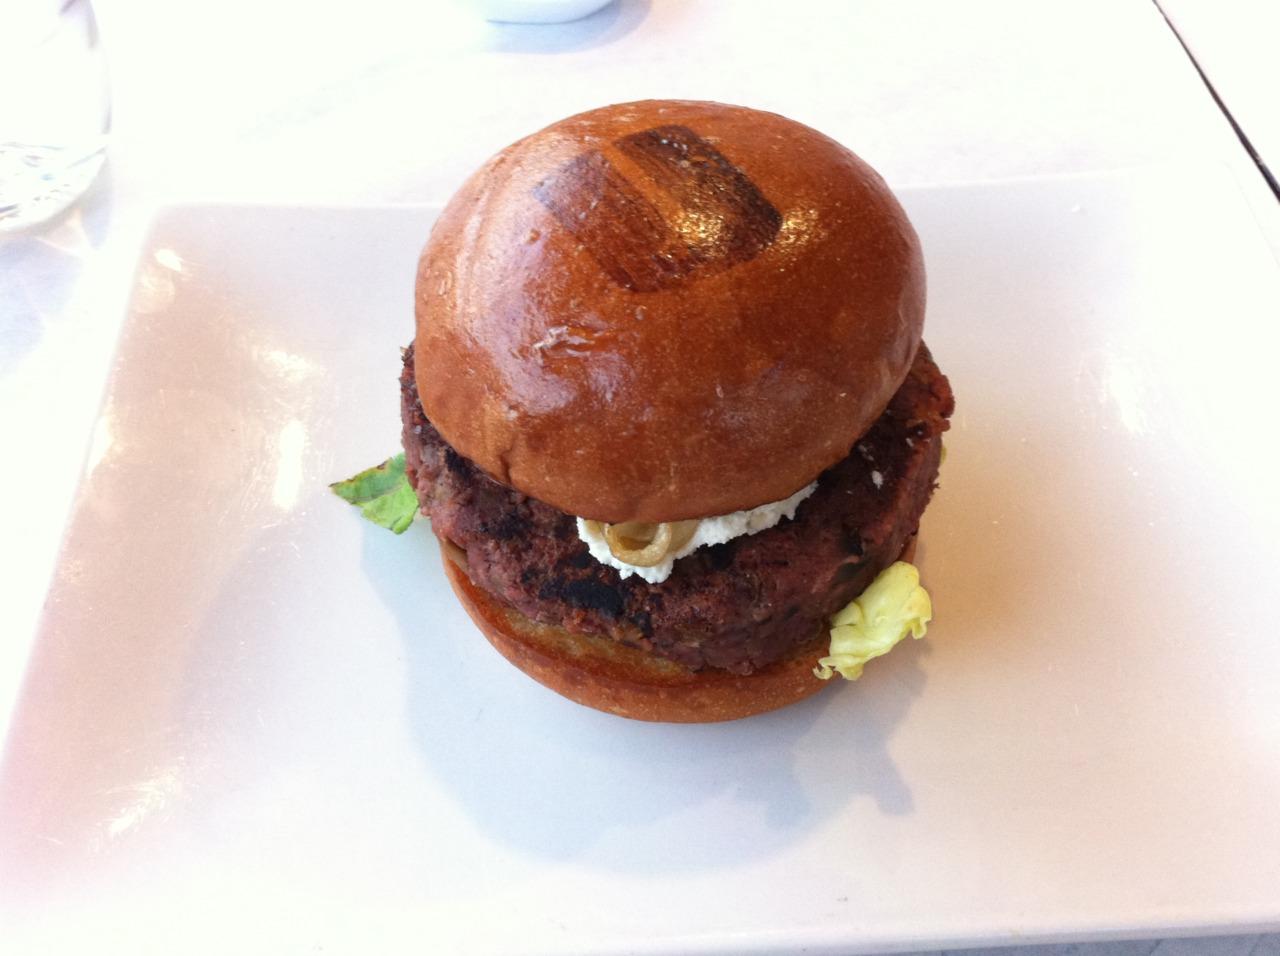 Umami Burger, Los Angeles     umamiburger.com     Earth Burger -Mushroom and edamame patty, white soy aioli, truffled ricotta cheese, cipollini onions, butter lettuce, slow-roasted tomato